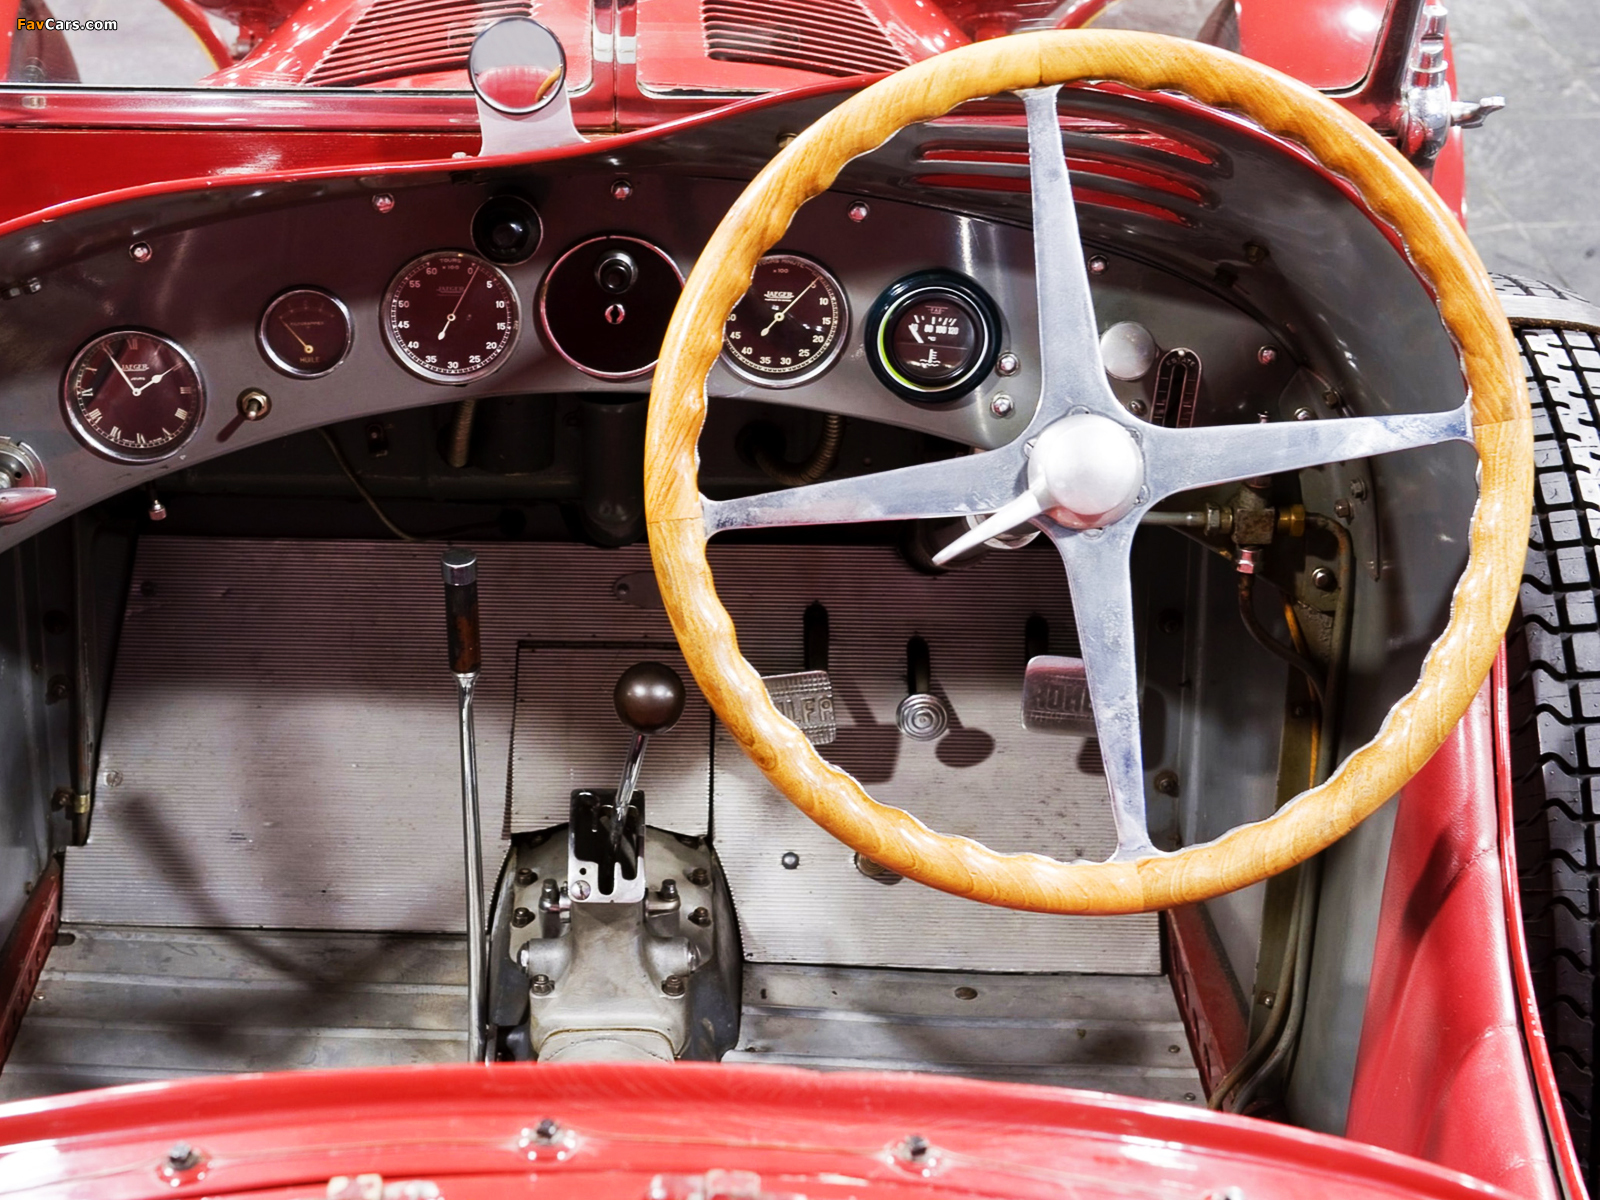 Pocher2 also Alfa Romeo 8C 2900B Lungo Touring Berli ta 61558 together with Interieur photo Alfa Romeo MiTo Quadrifoglio Verde 2014 image additionally Pur Sang 308 Debuts 2014 Goodwood Revival furthermore Alfa Romeo 8C 2900B Touring Berli ta 77330. on alfa romeo 8c